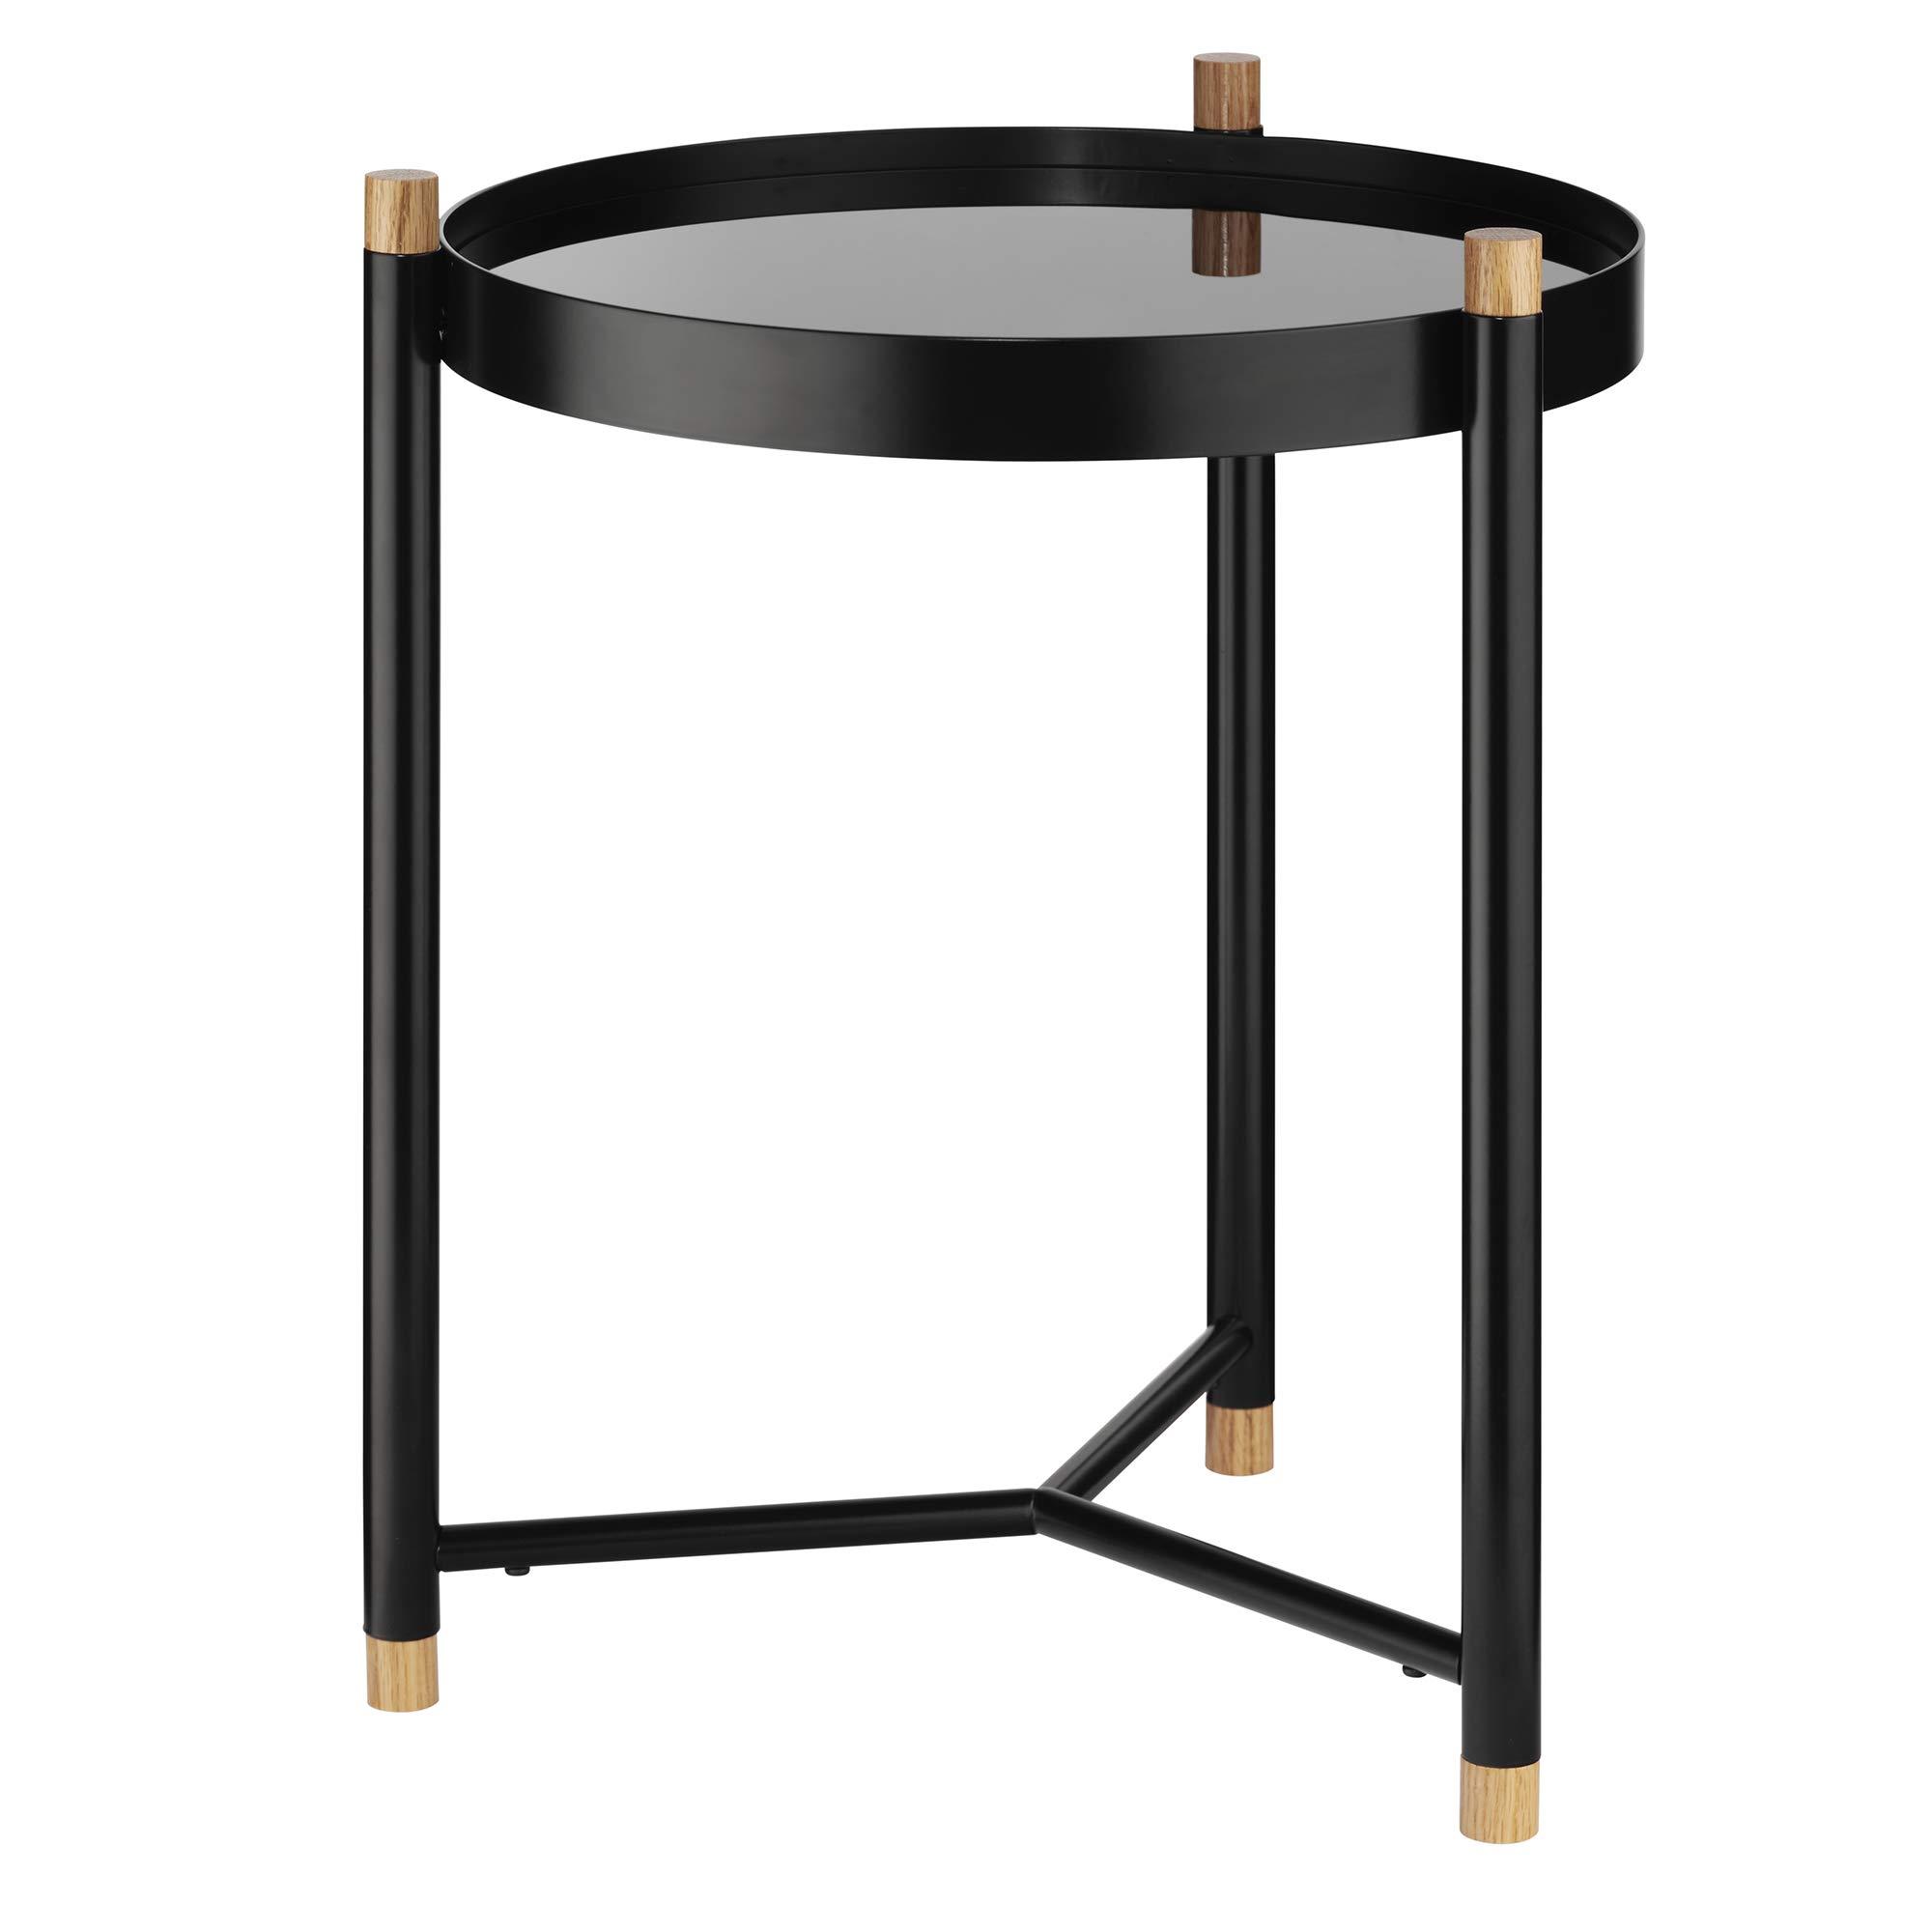 Kela Oak Coffee Table, Metal, Black, 40x 40x 52.5cm by Kela (Image #8)